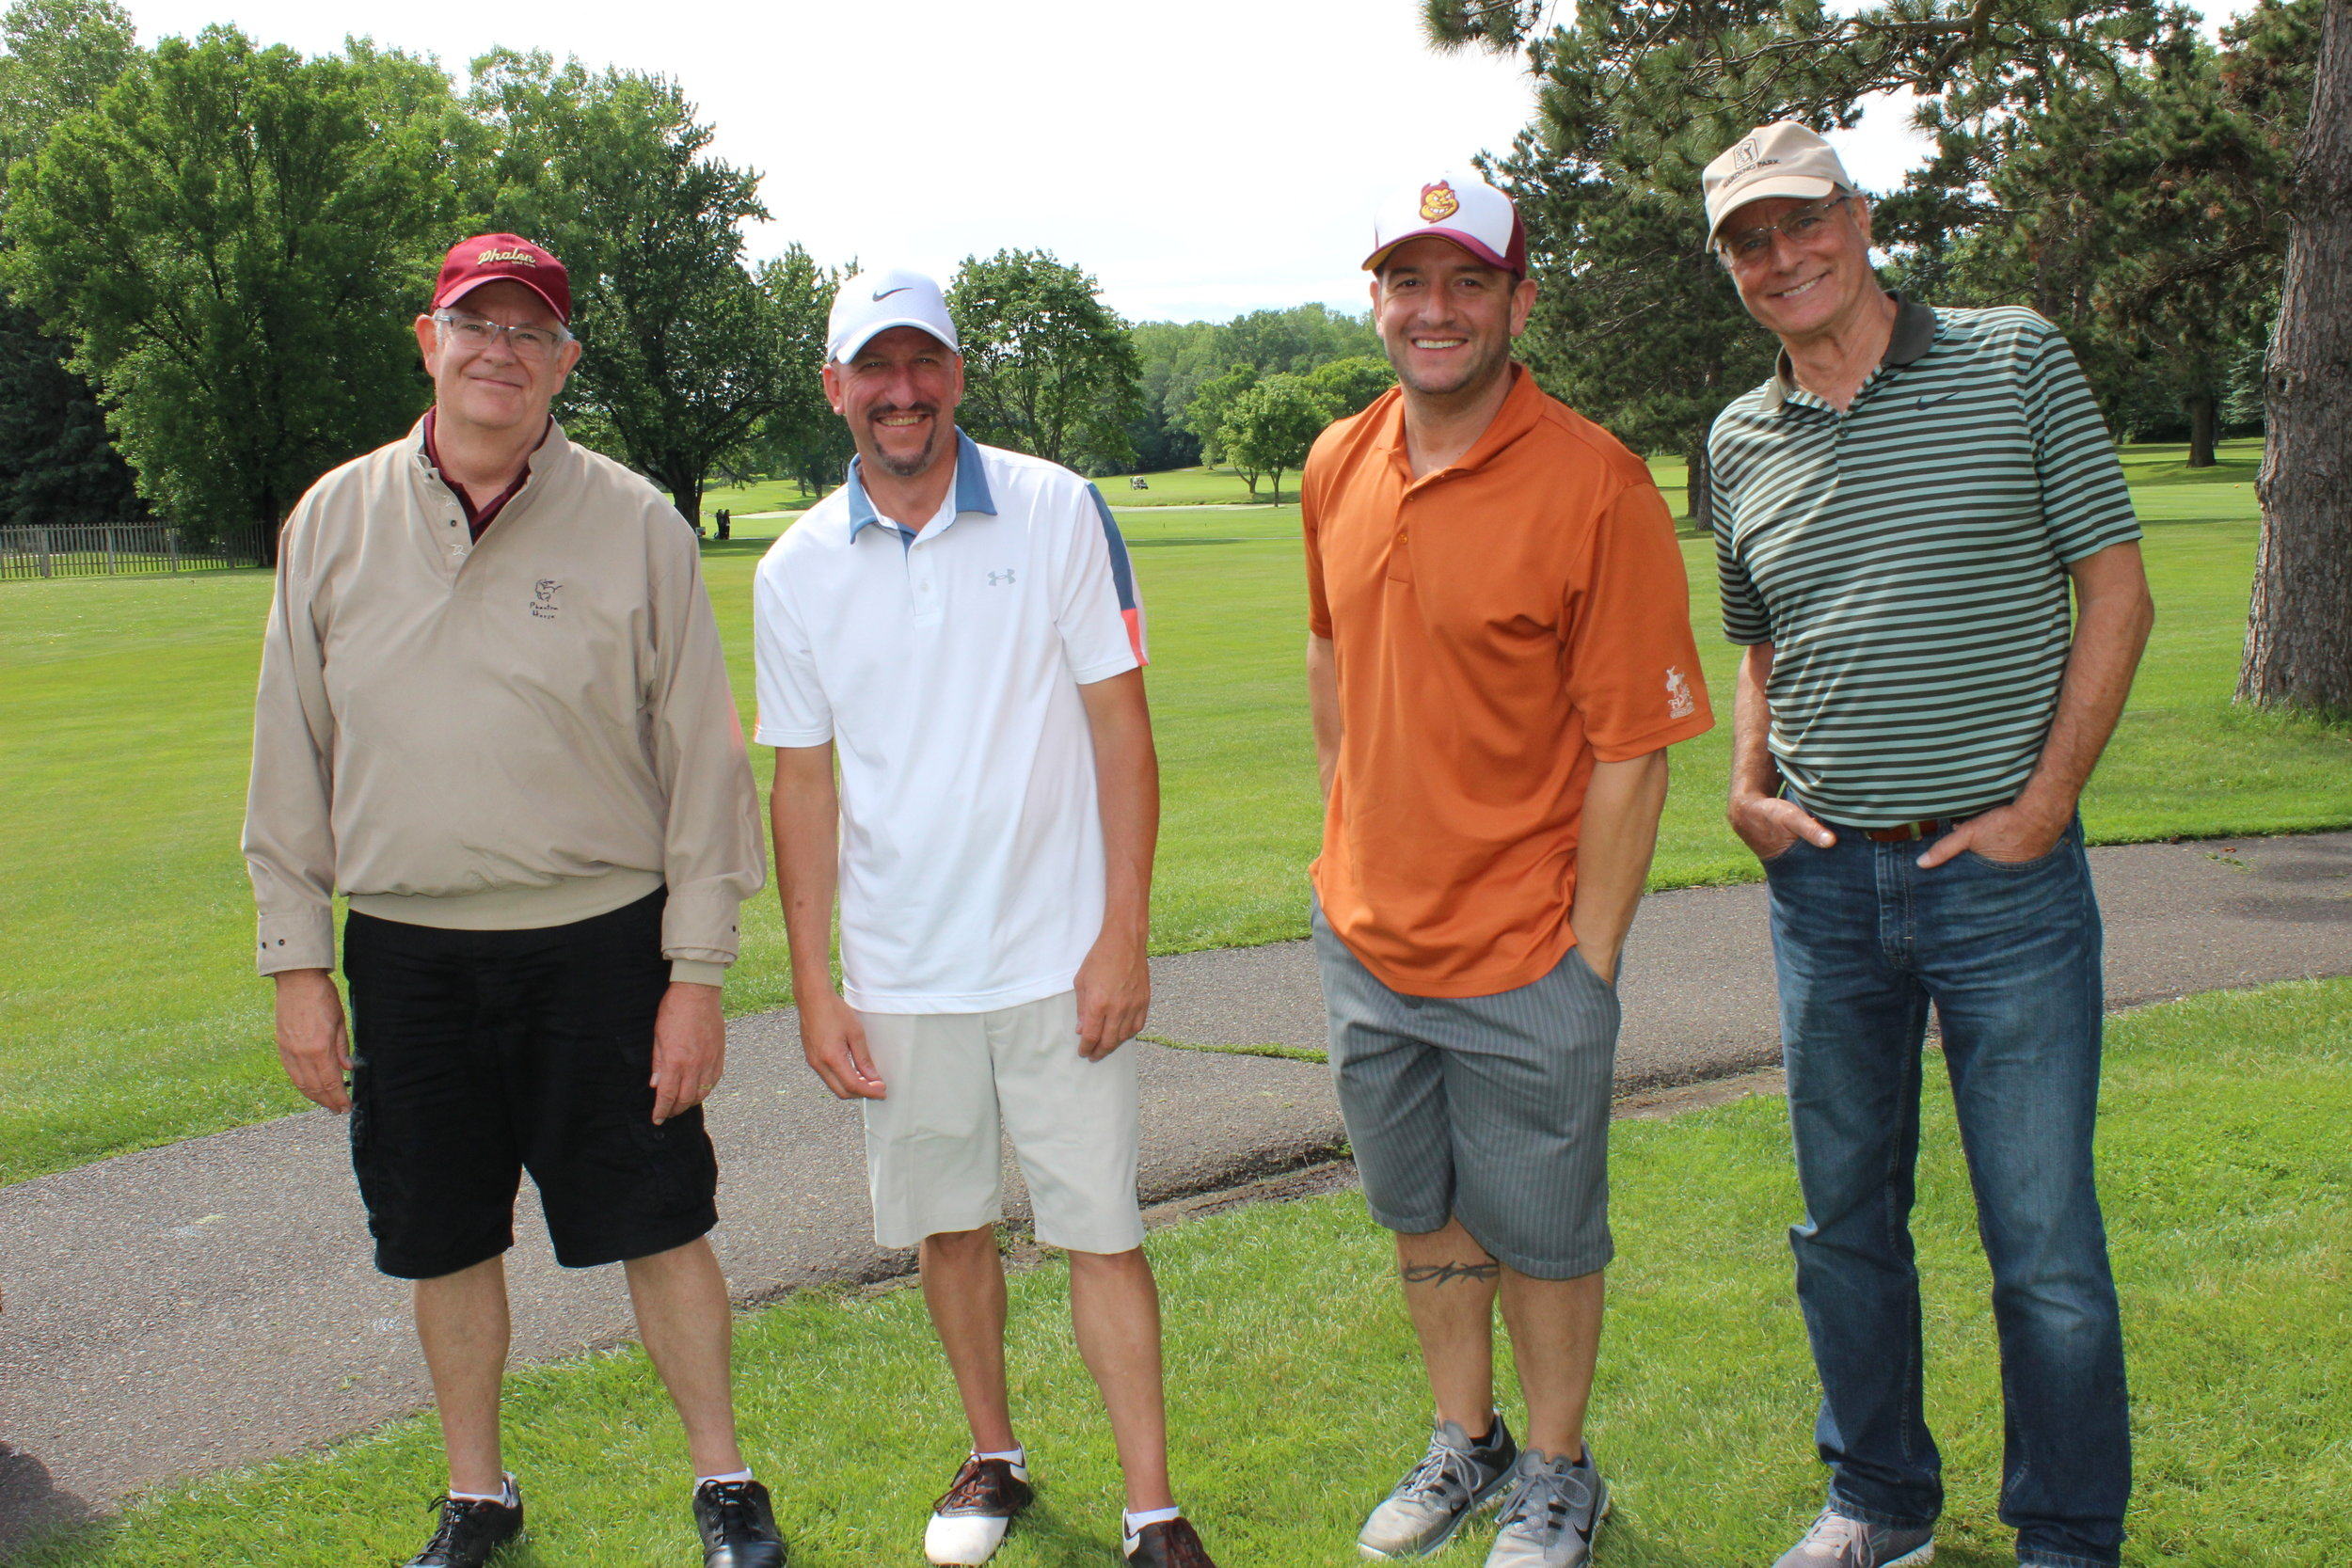 13B Peter Cote_, Shawn Langer, Nathan Carbone, Steve Matysik.JPG